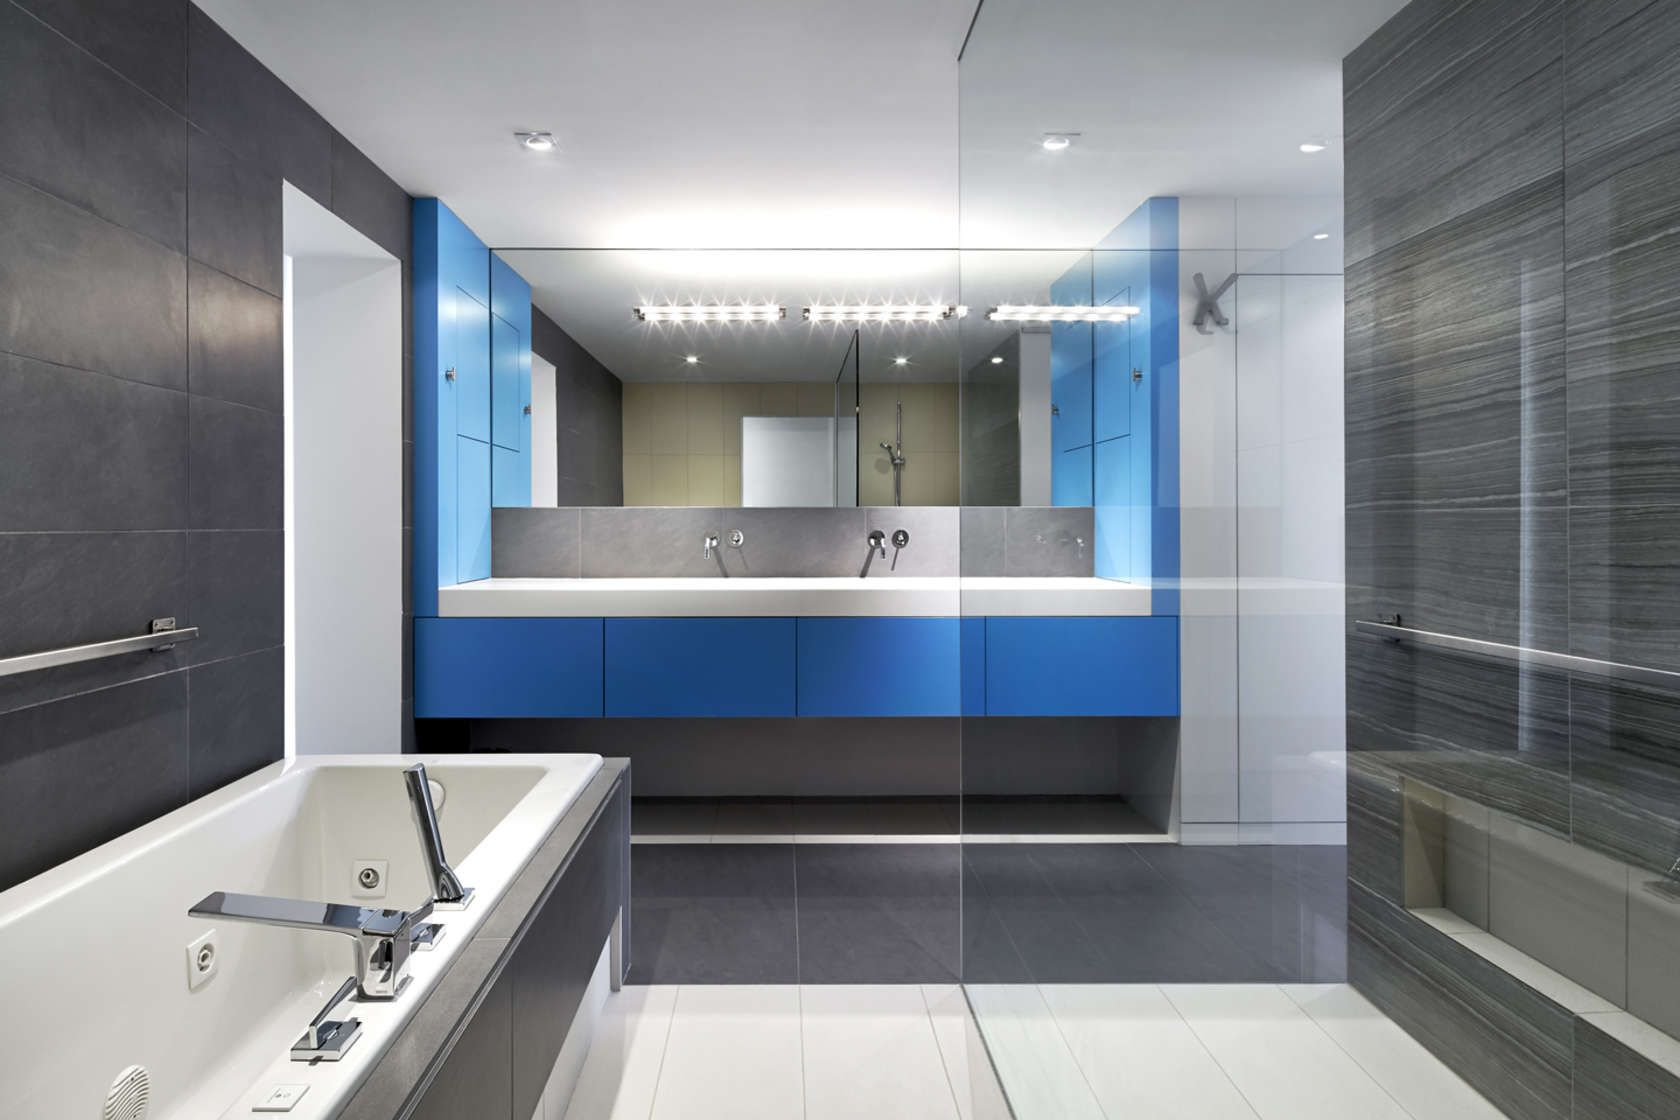 Bathroom:Luxury Bathtub Ideas For Bathroom Decor Light Bath Bar Decorating  Ideas For Bathrooms Best